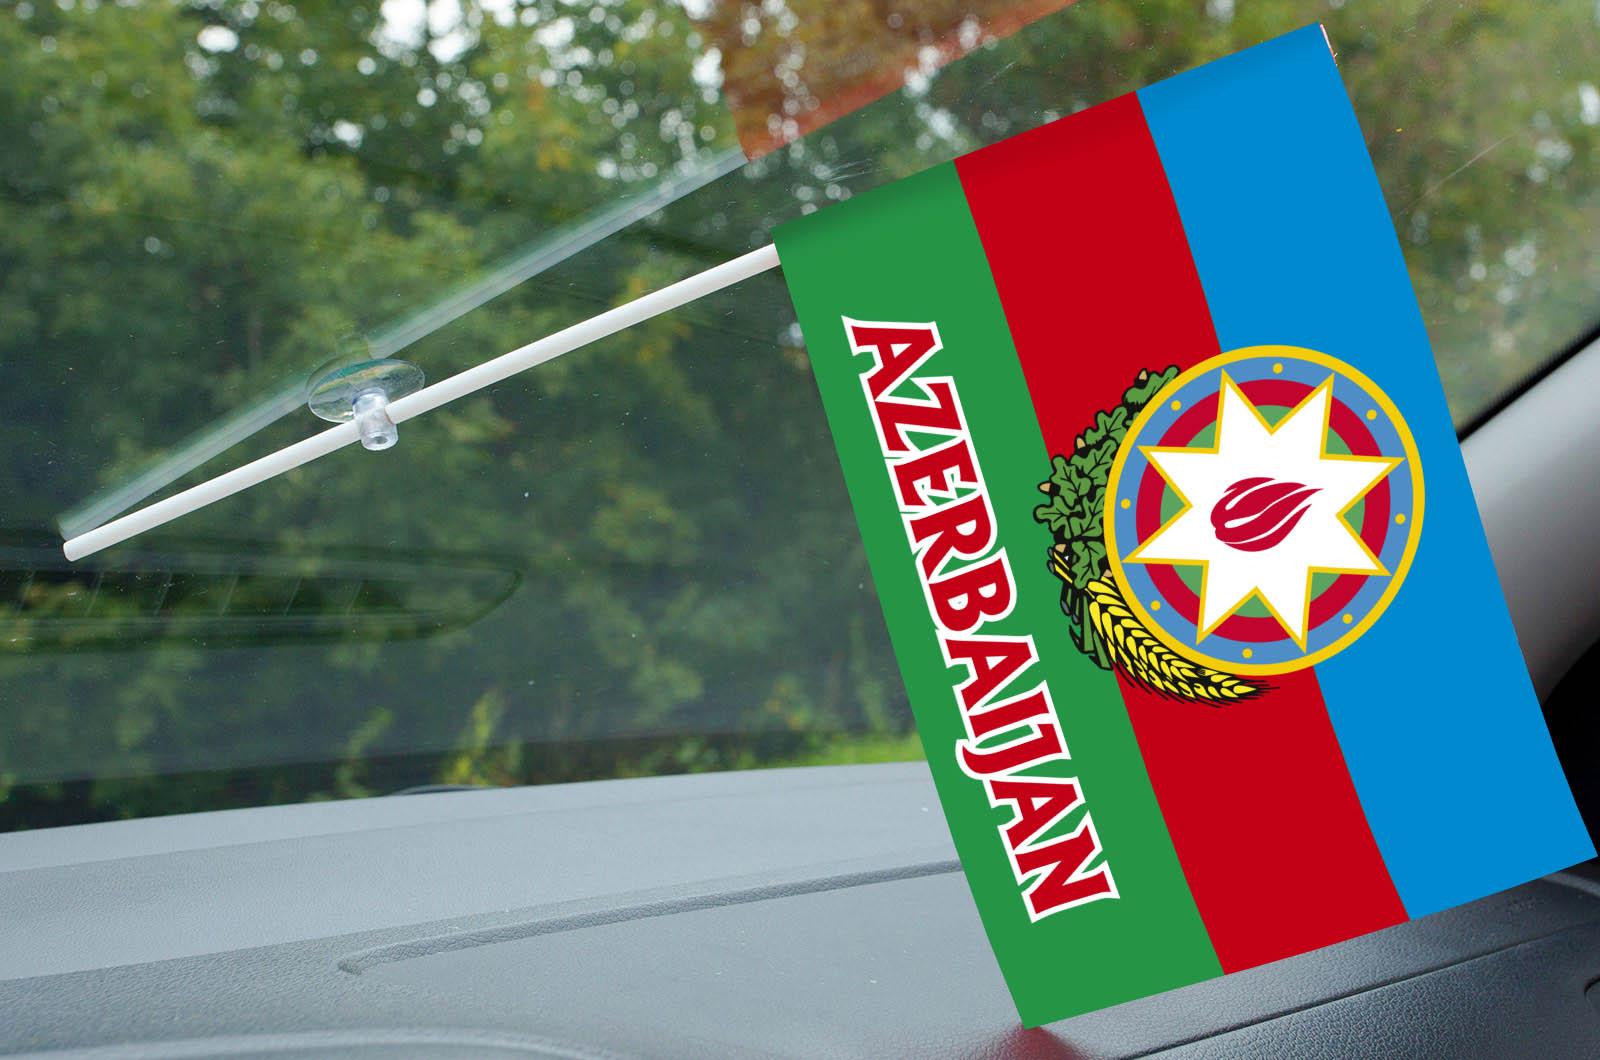 Флажок Азербайджана с надписью